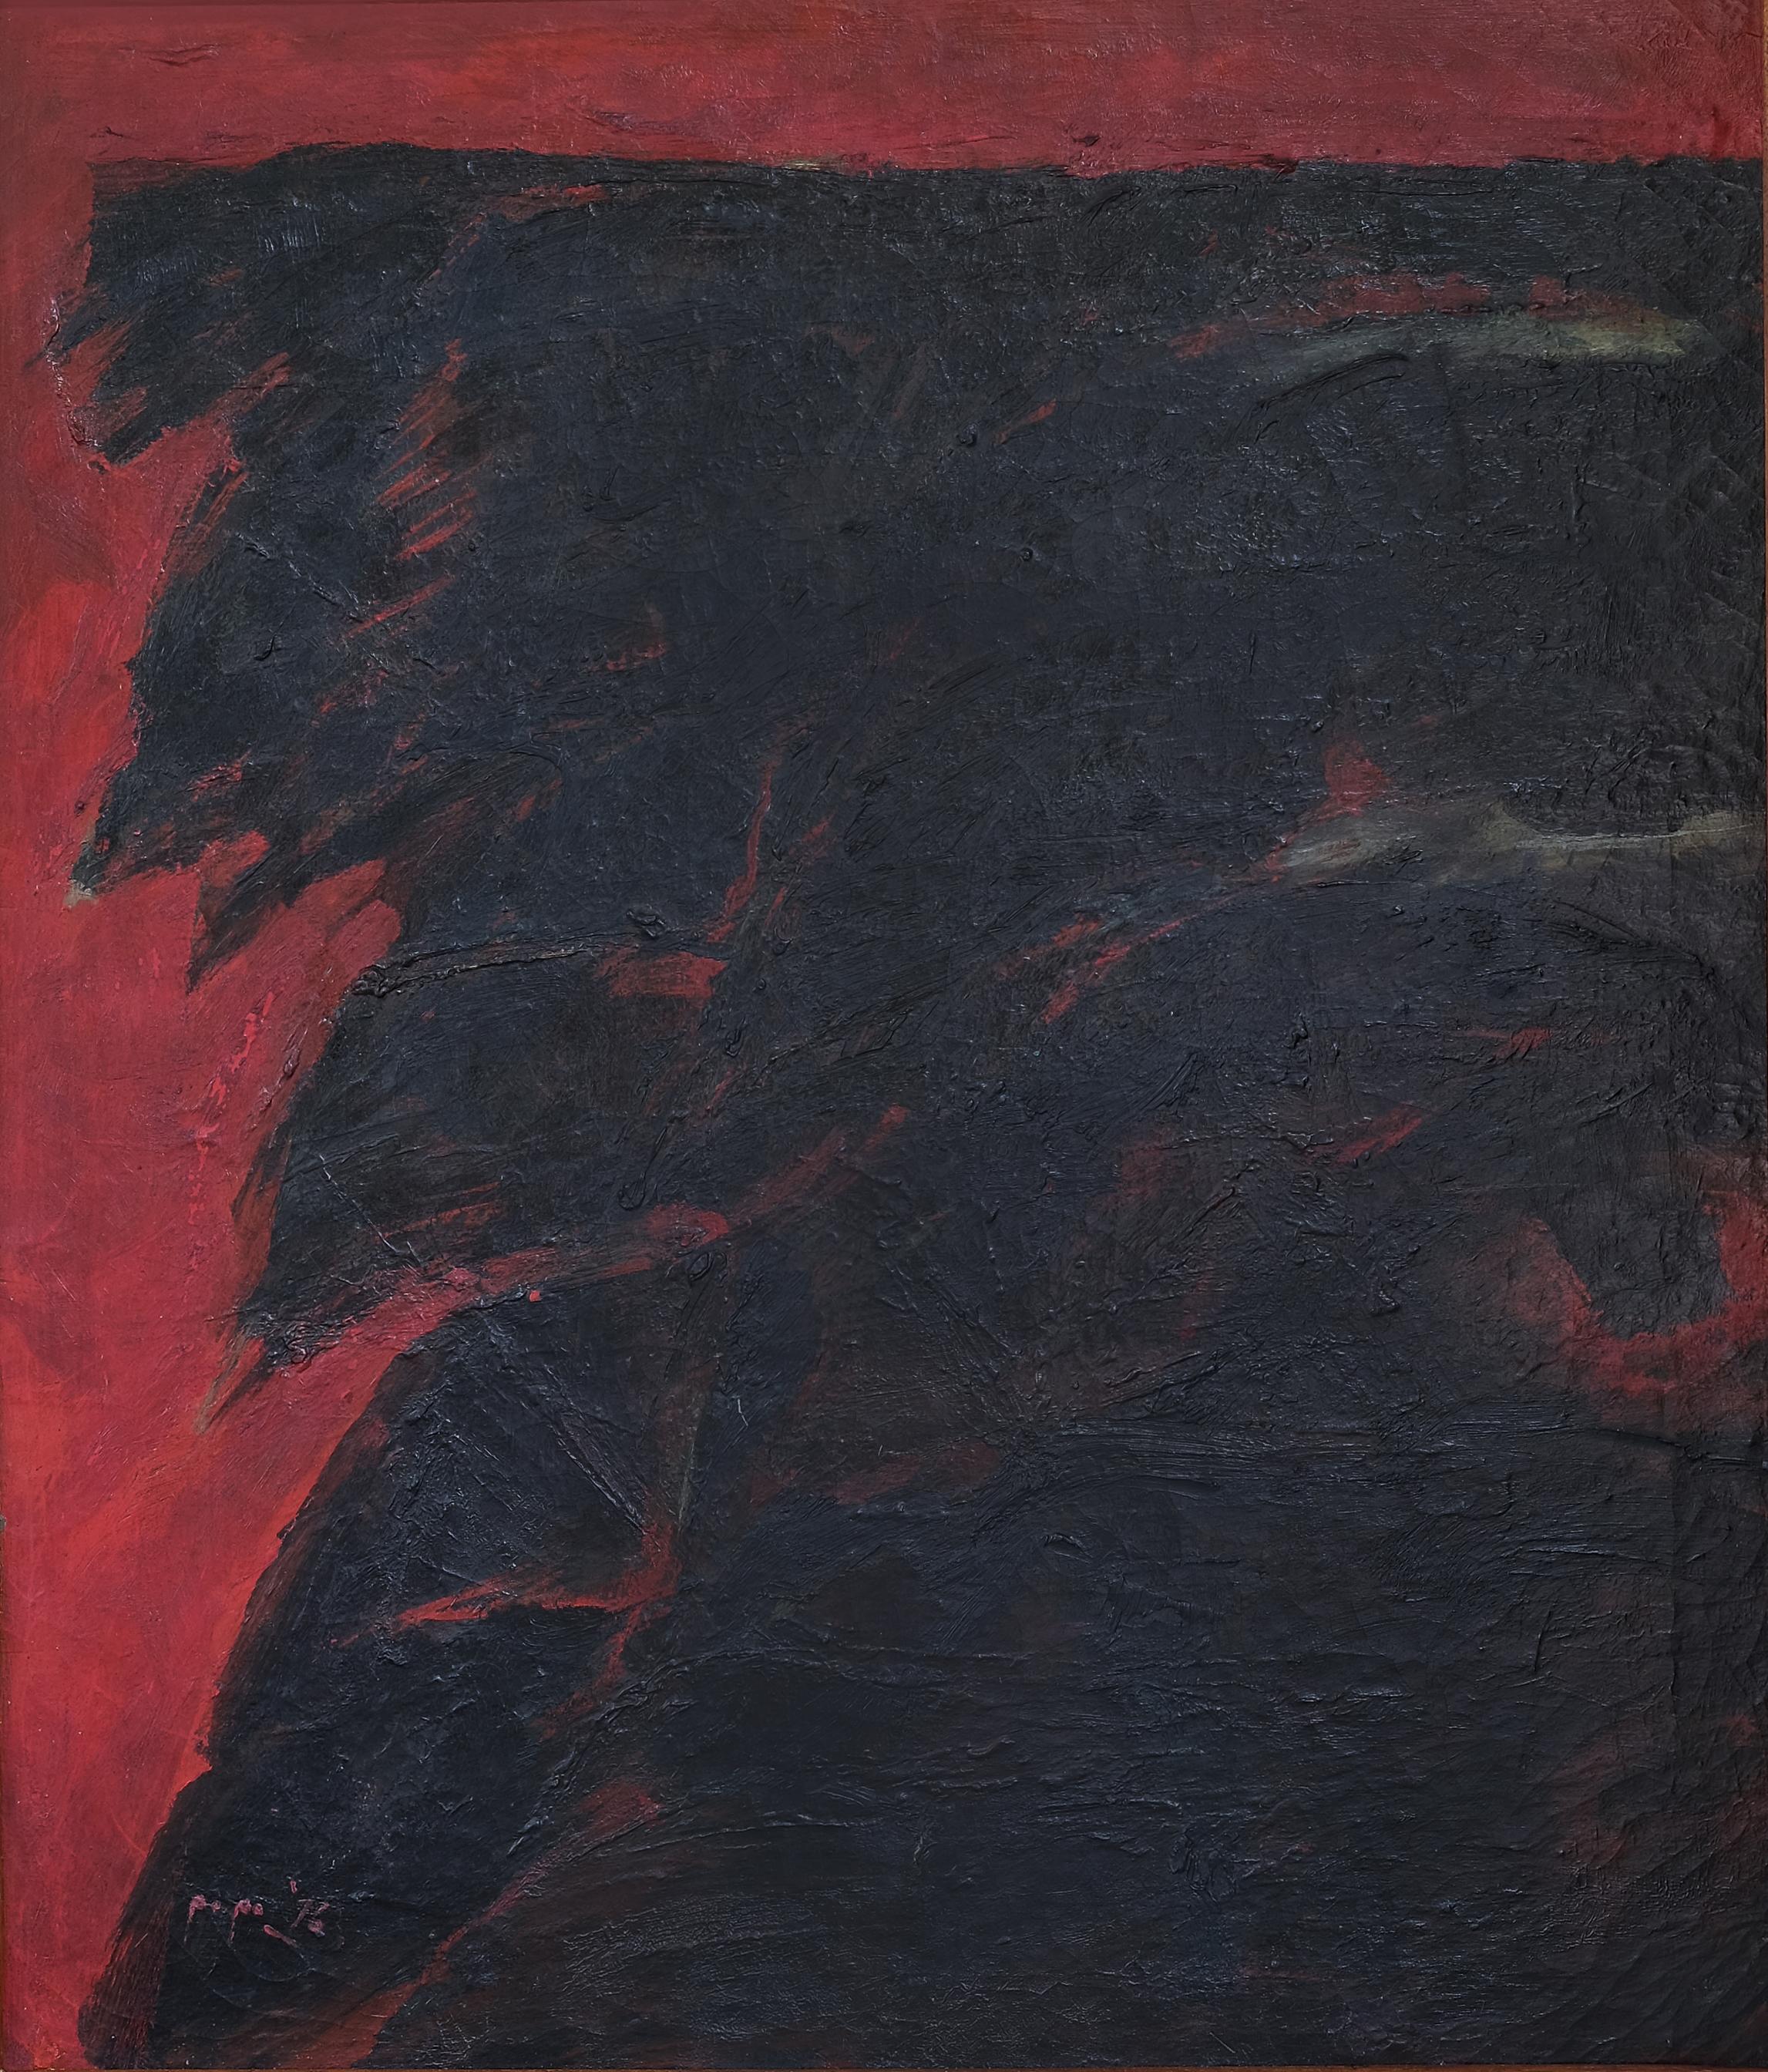 Popo Iskandar, Cahaya dicelah Kabut Pagi (Dawn Peeking behind the Morning Fog), ooc, 70 x 60 cm, 1976.jpeg